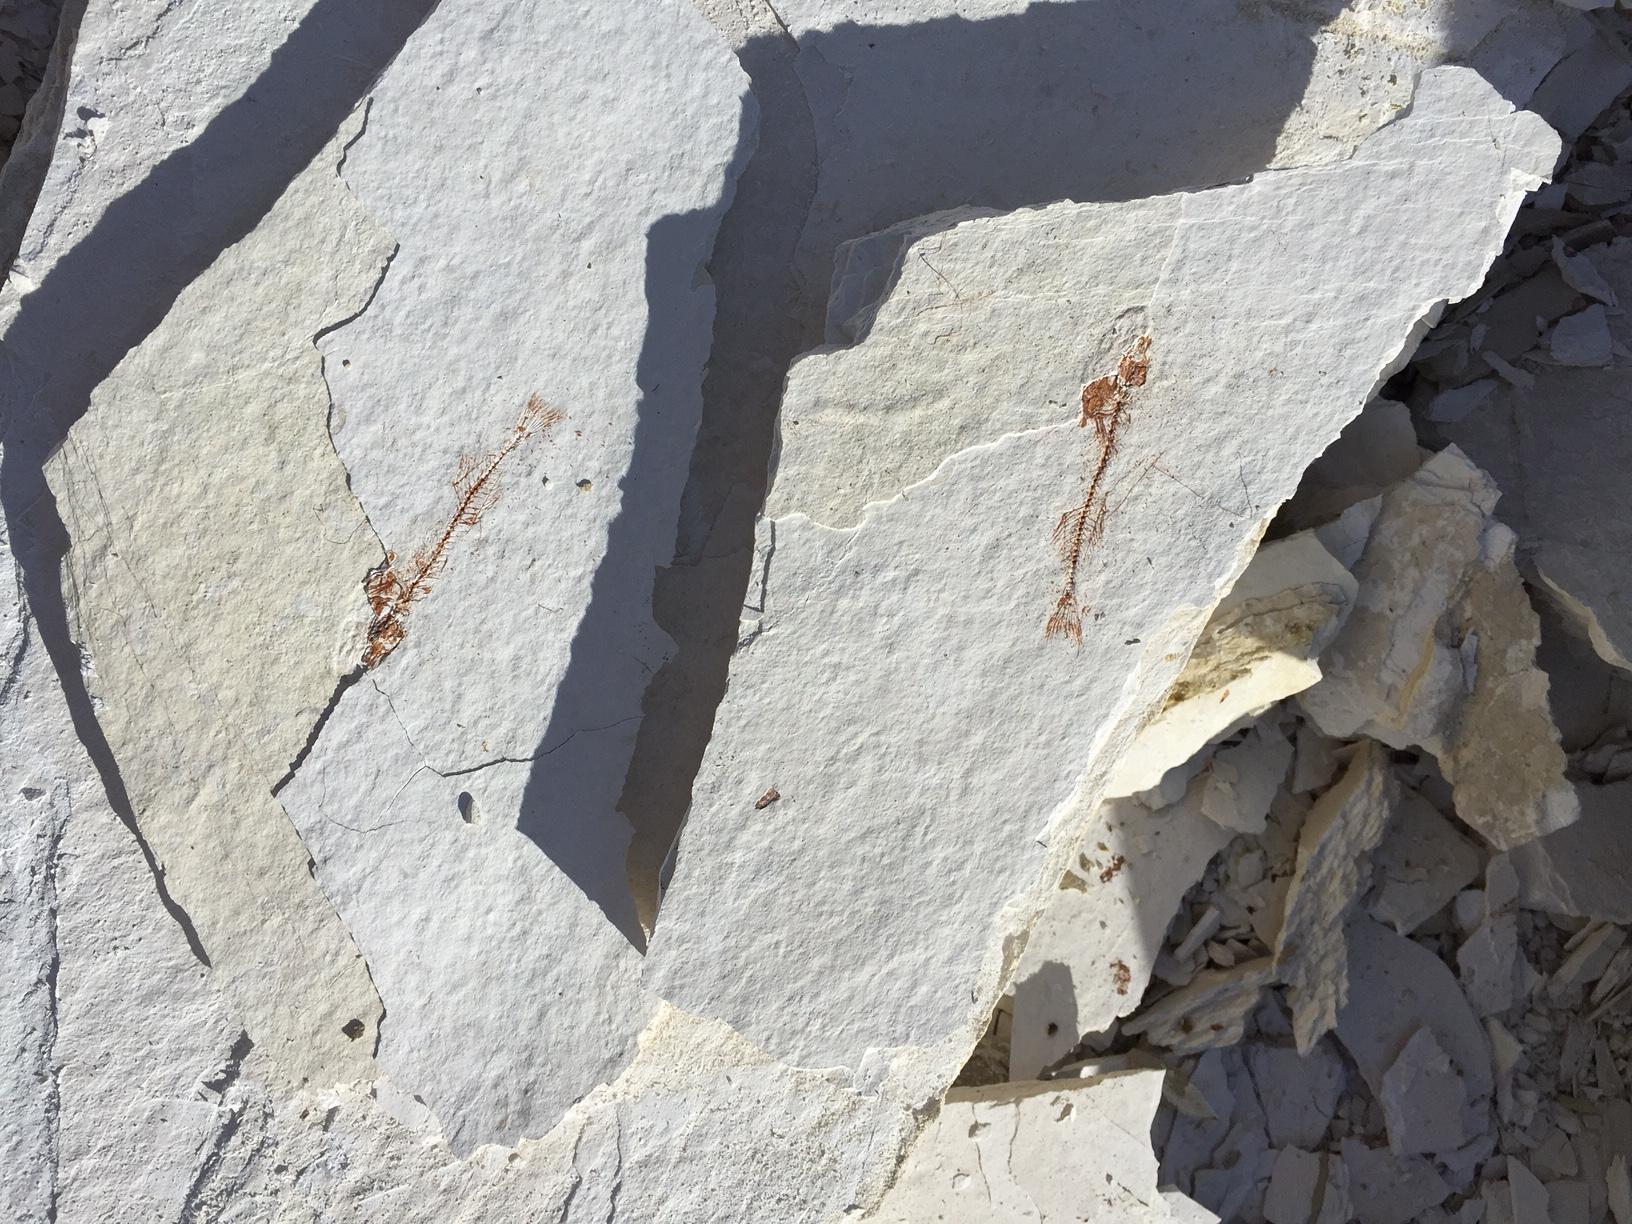 10 million year old Stickleback fish